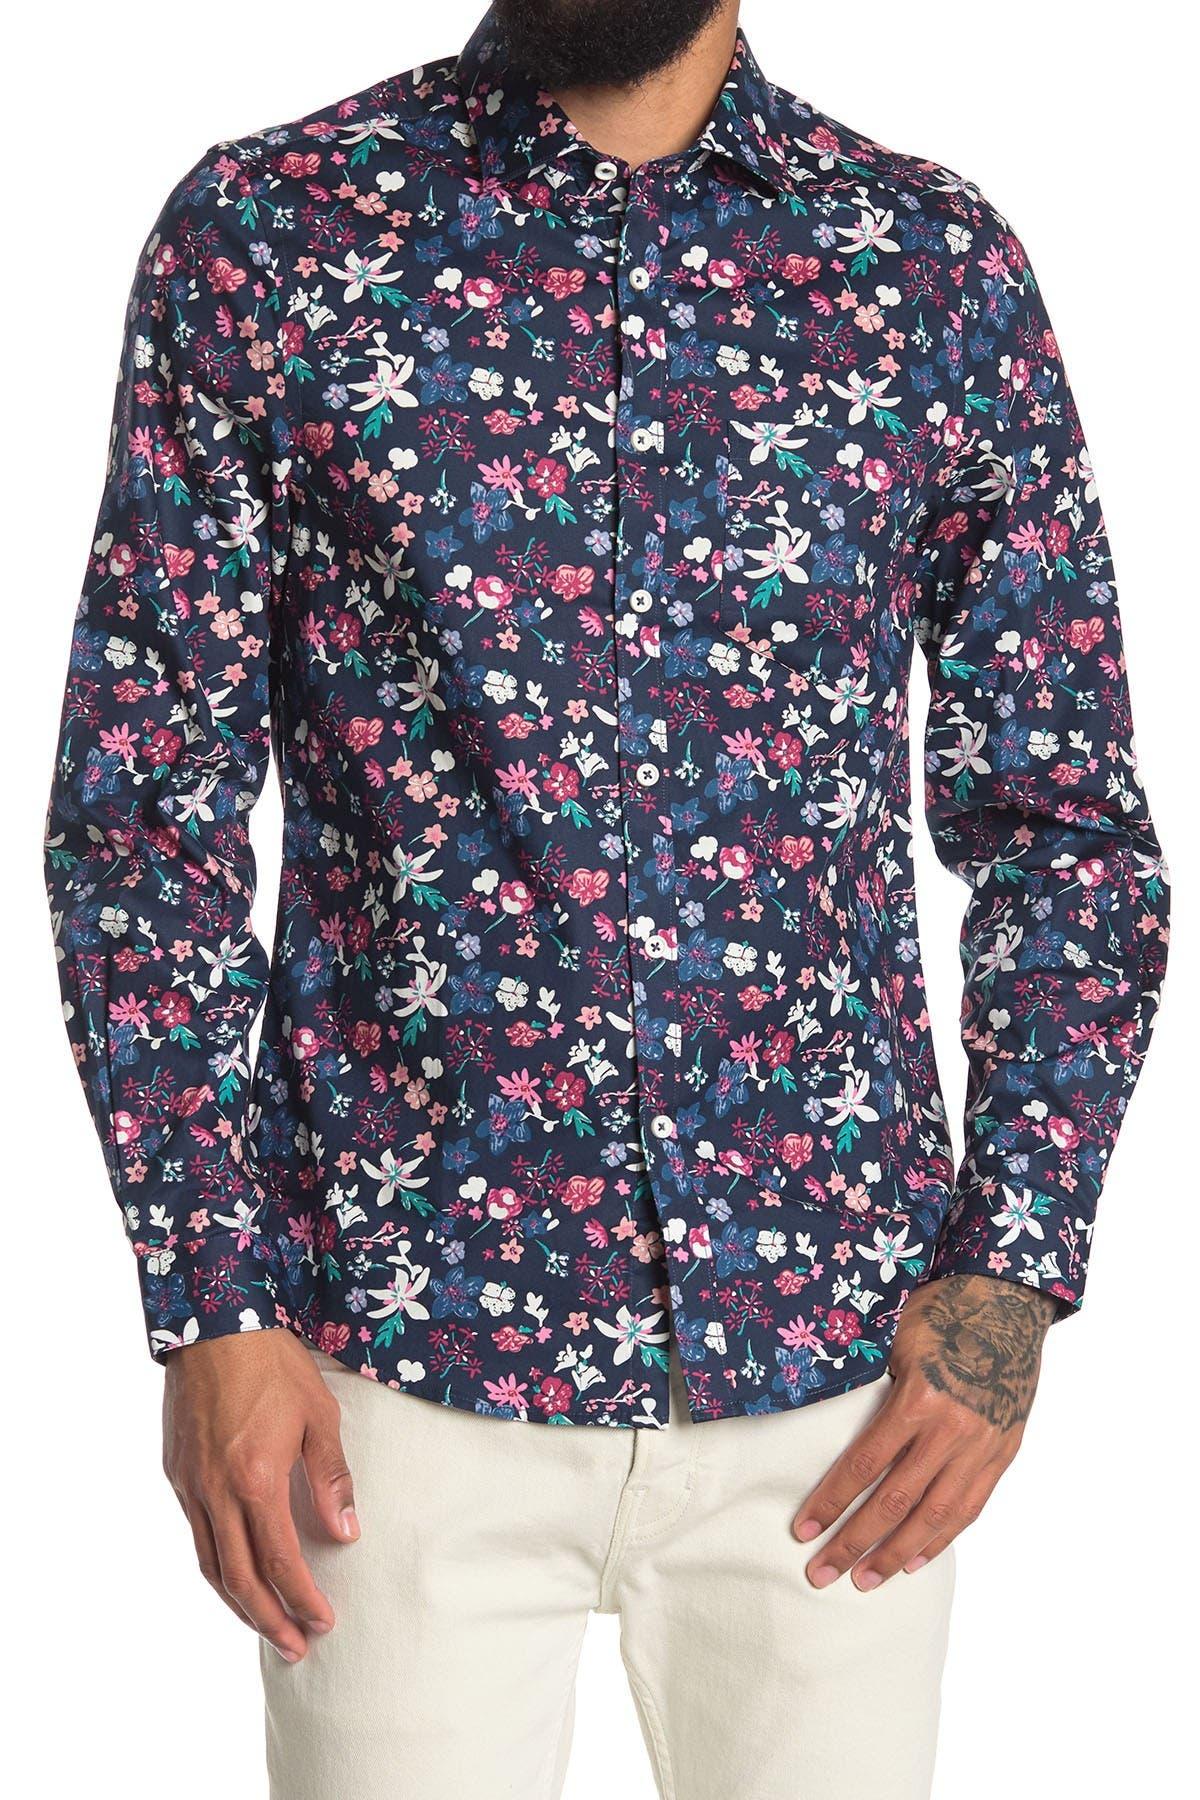 Image of Paisley & Gray Floral Print Slim Fit Shirt